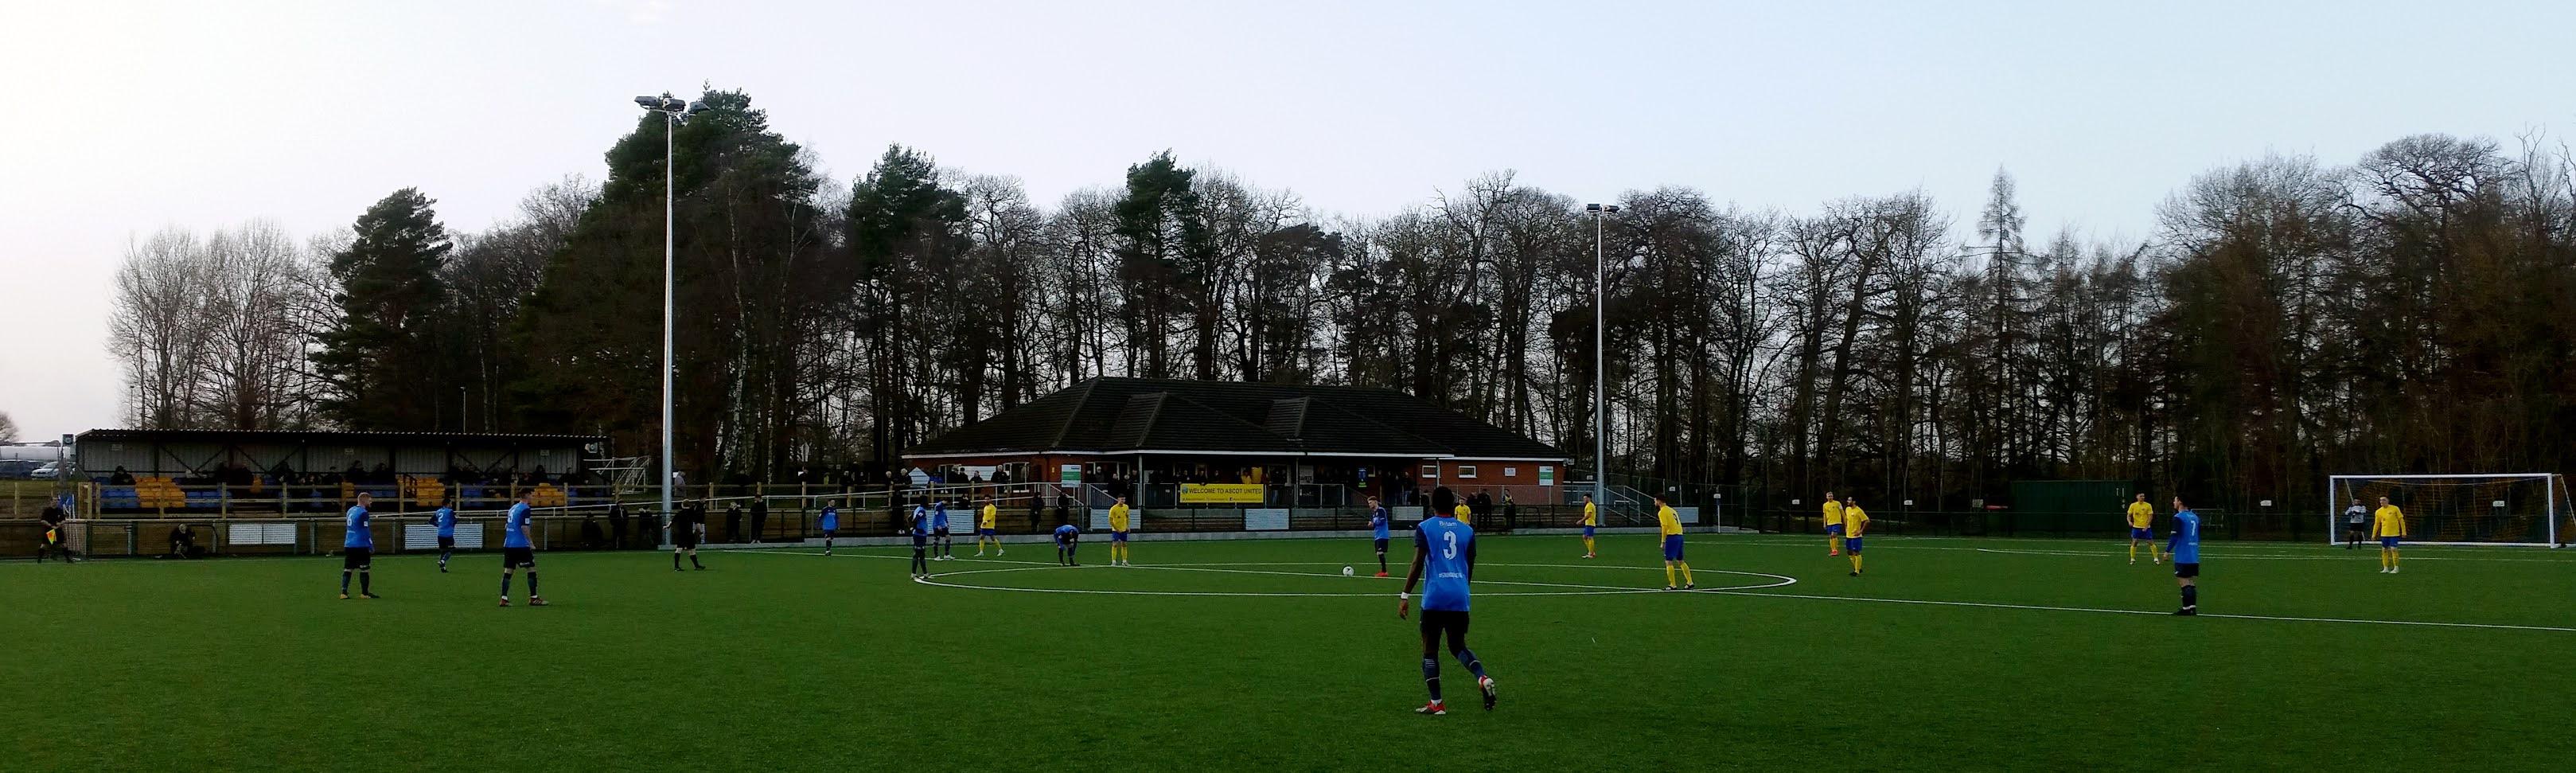 Ascot United's Racecourse Ground